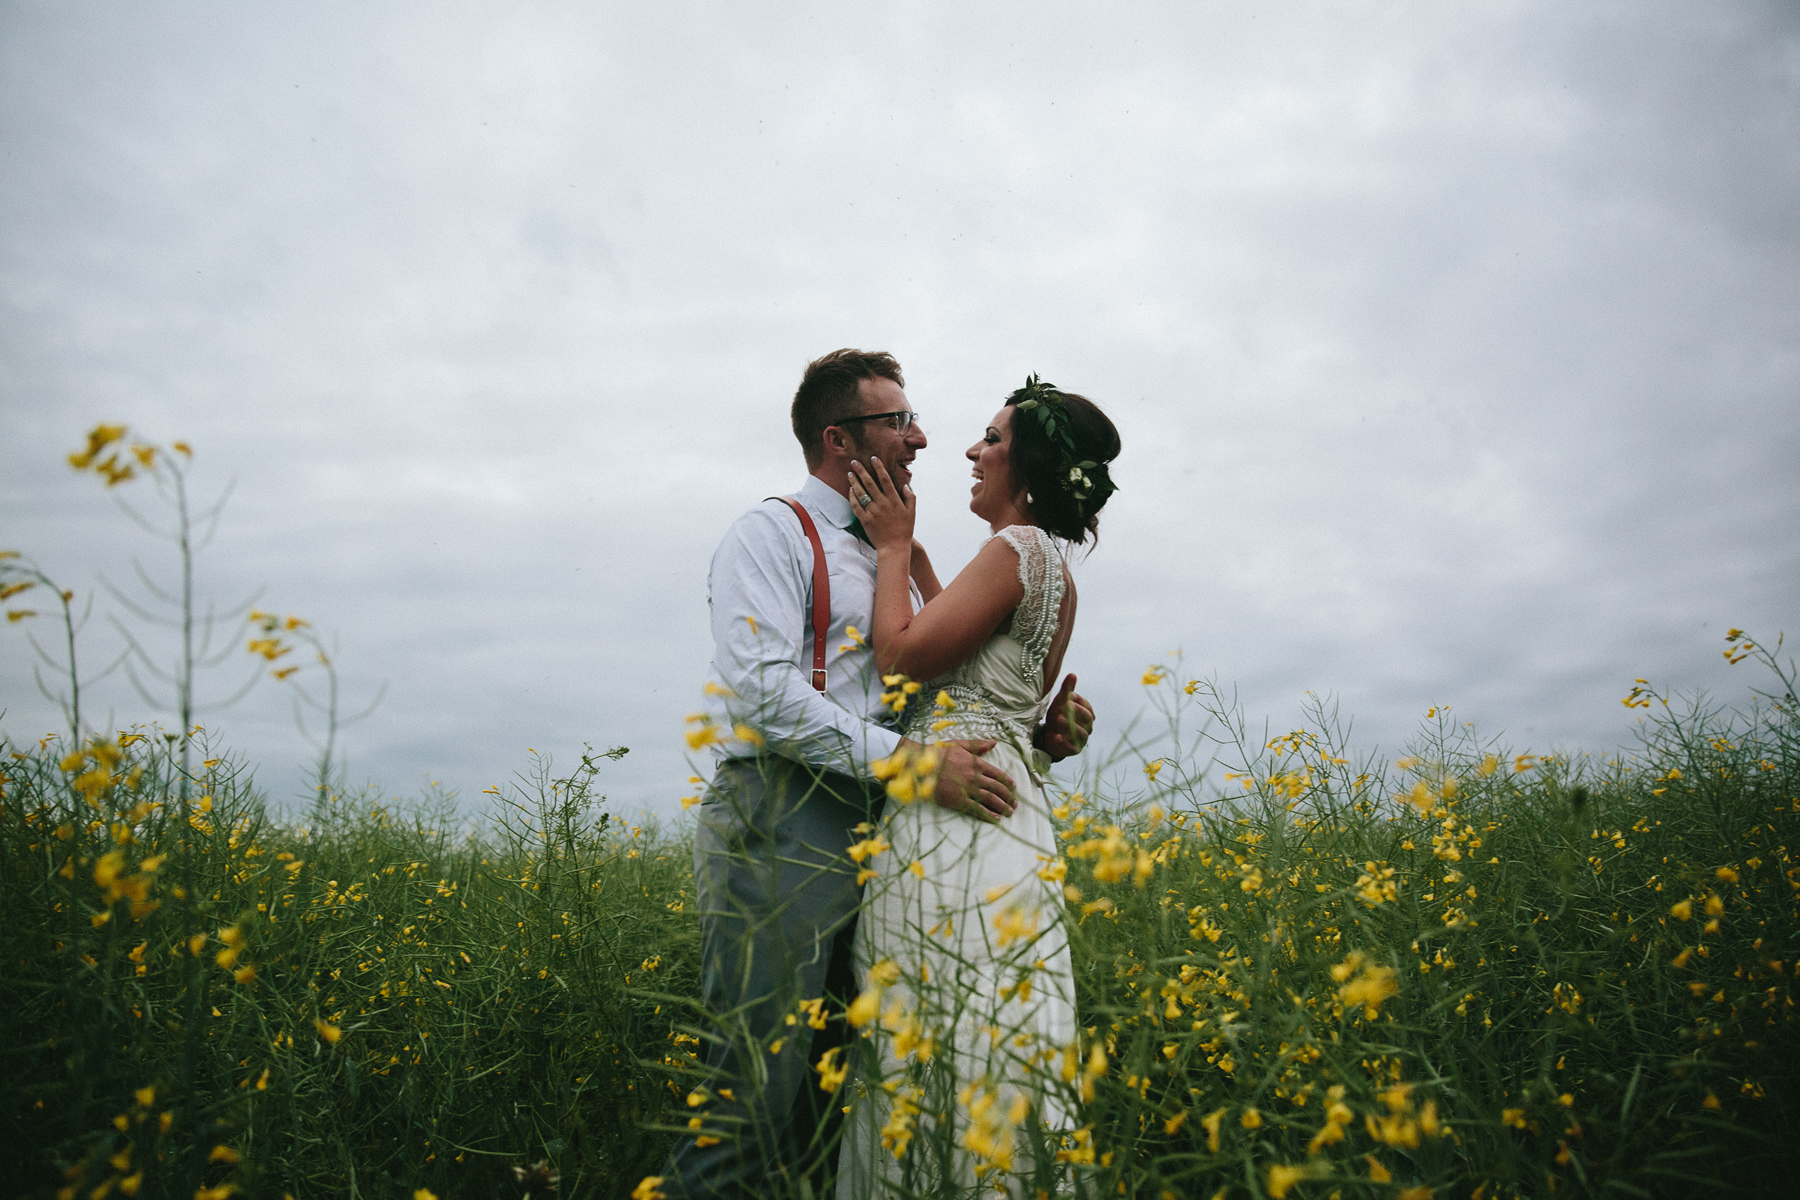 alberta-farm-wedding-photographer-rp-wj-228.jpg